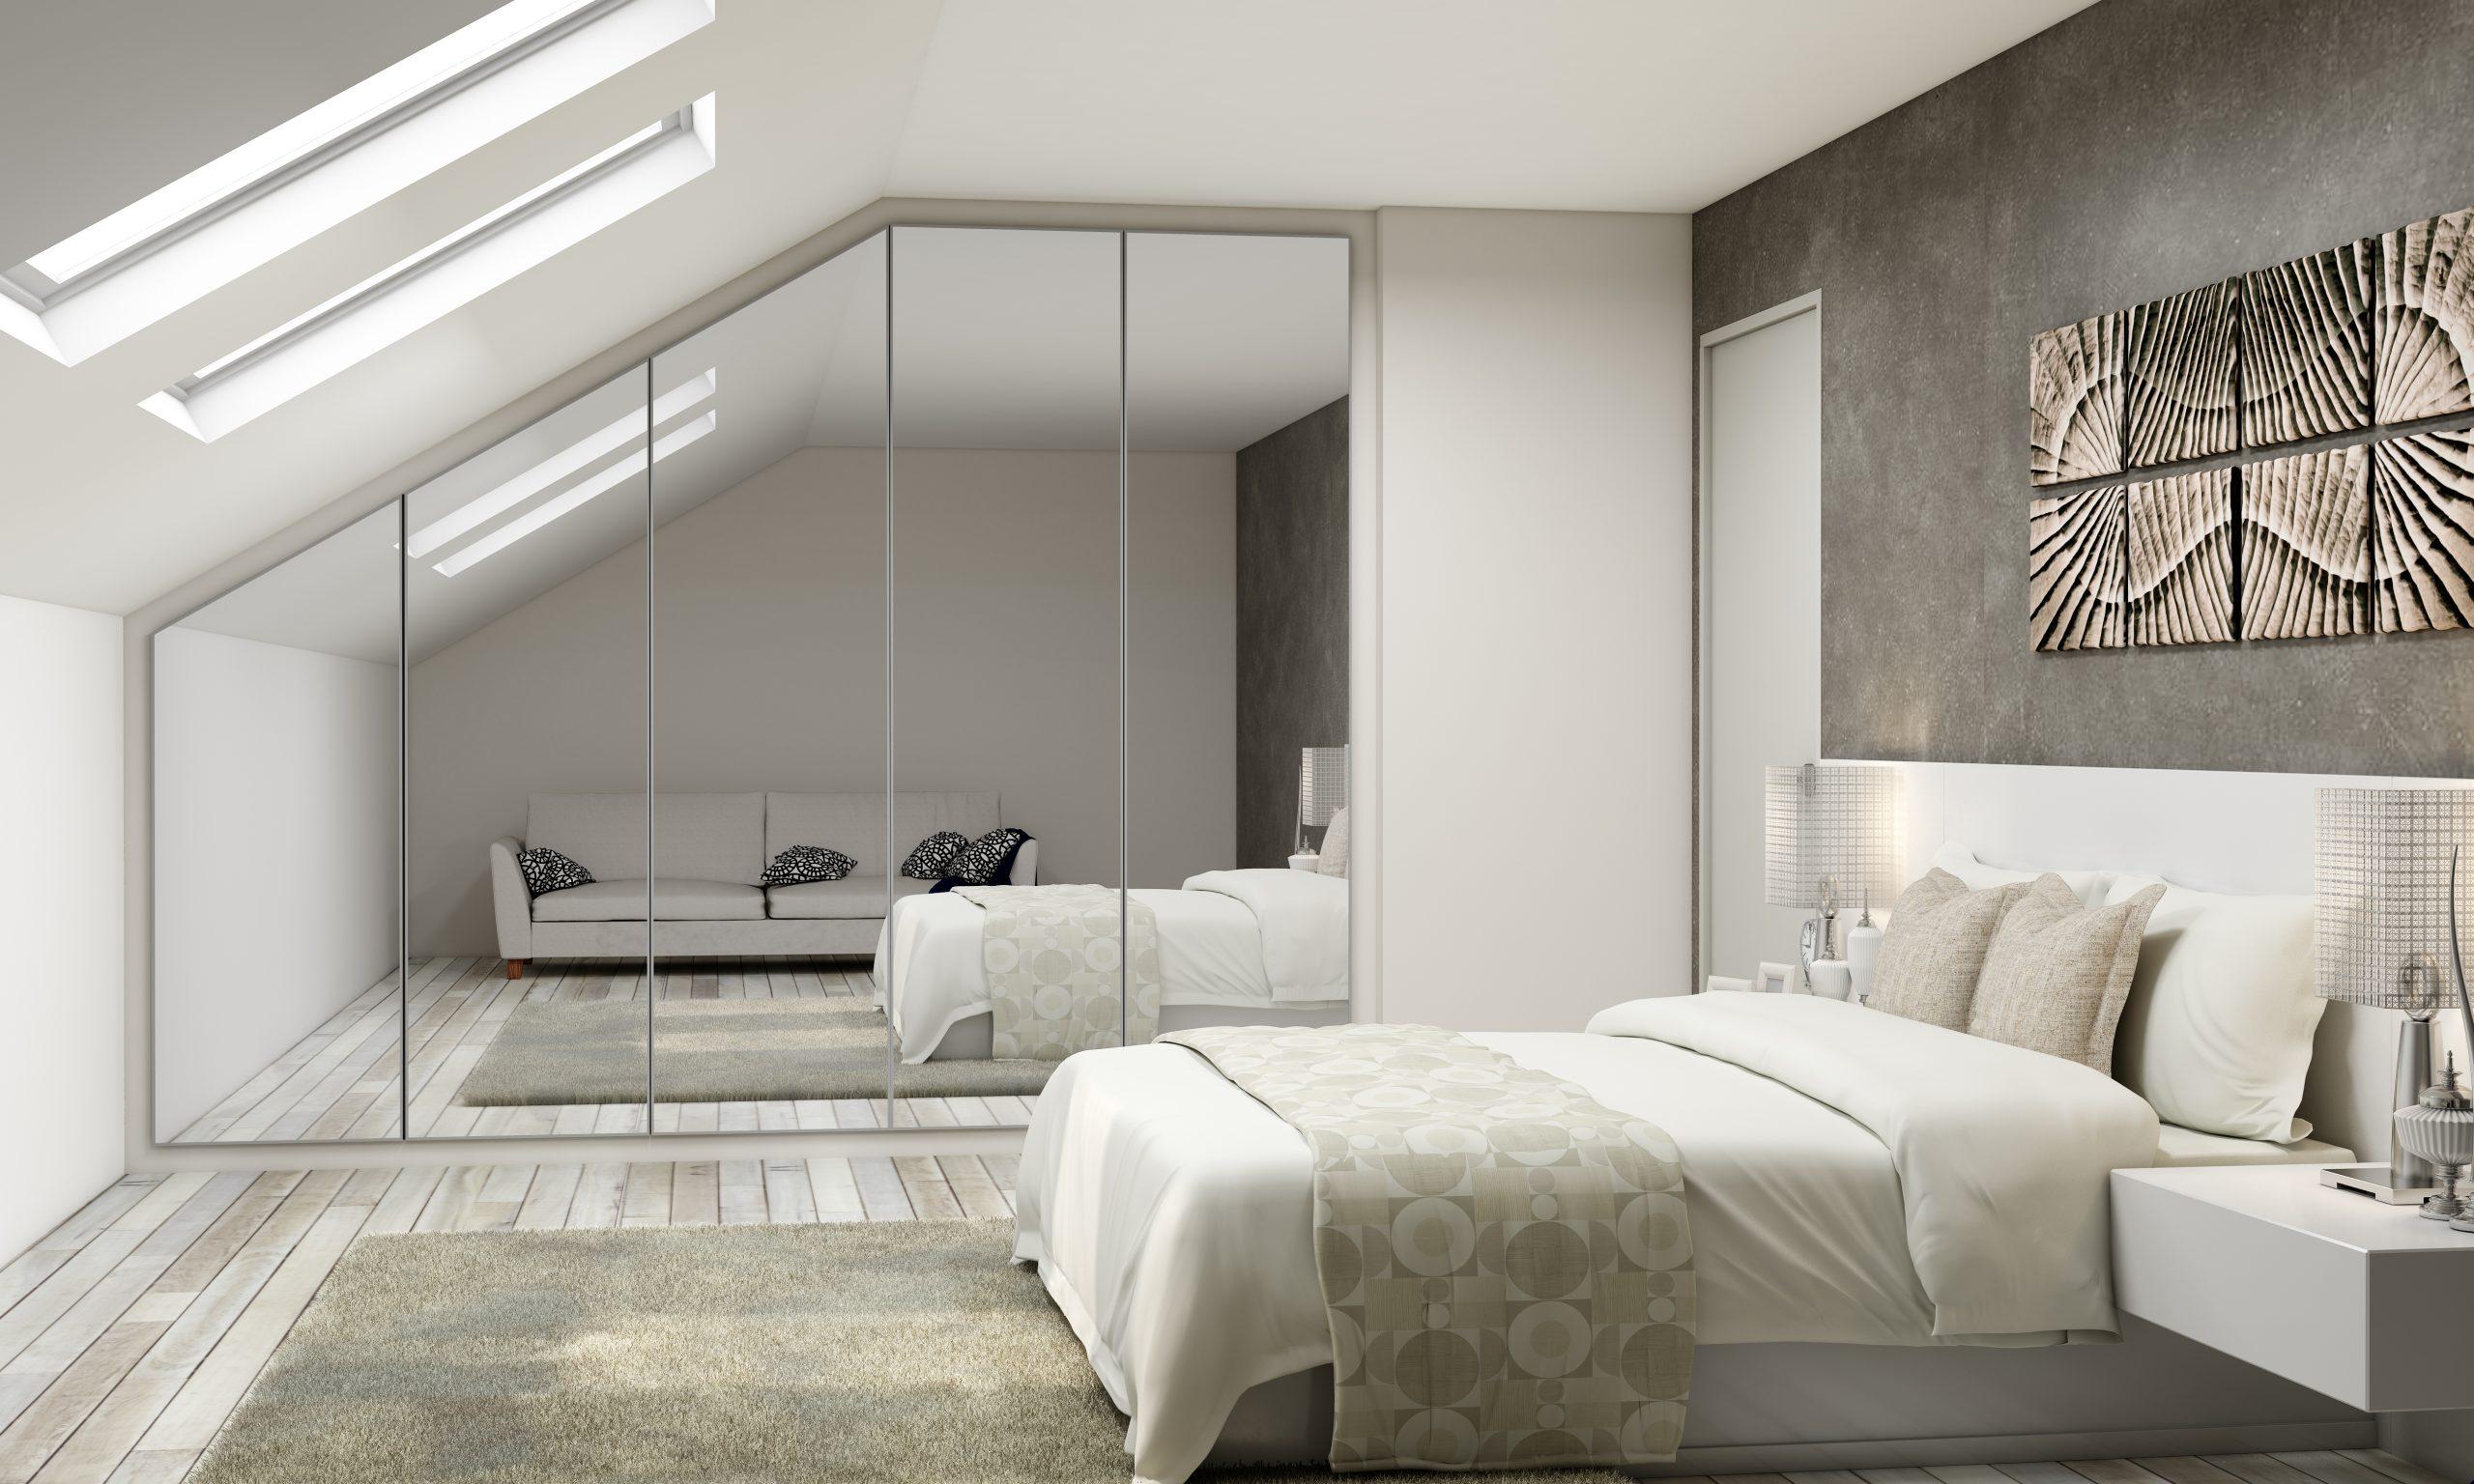 Bespoke Loft conversion with full mirror doors